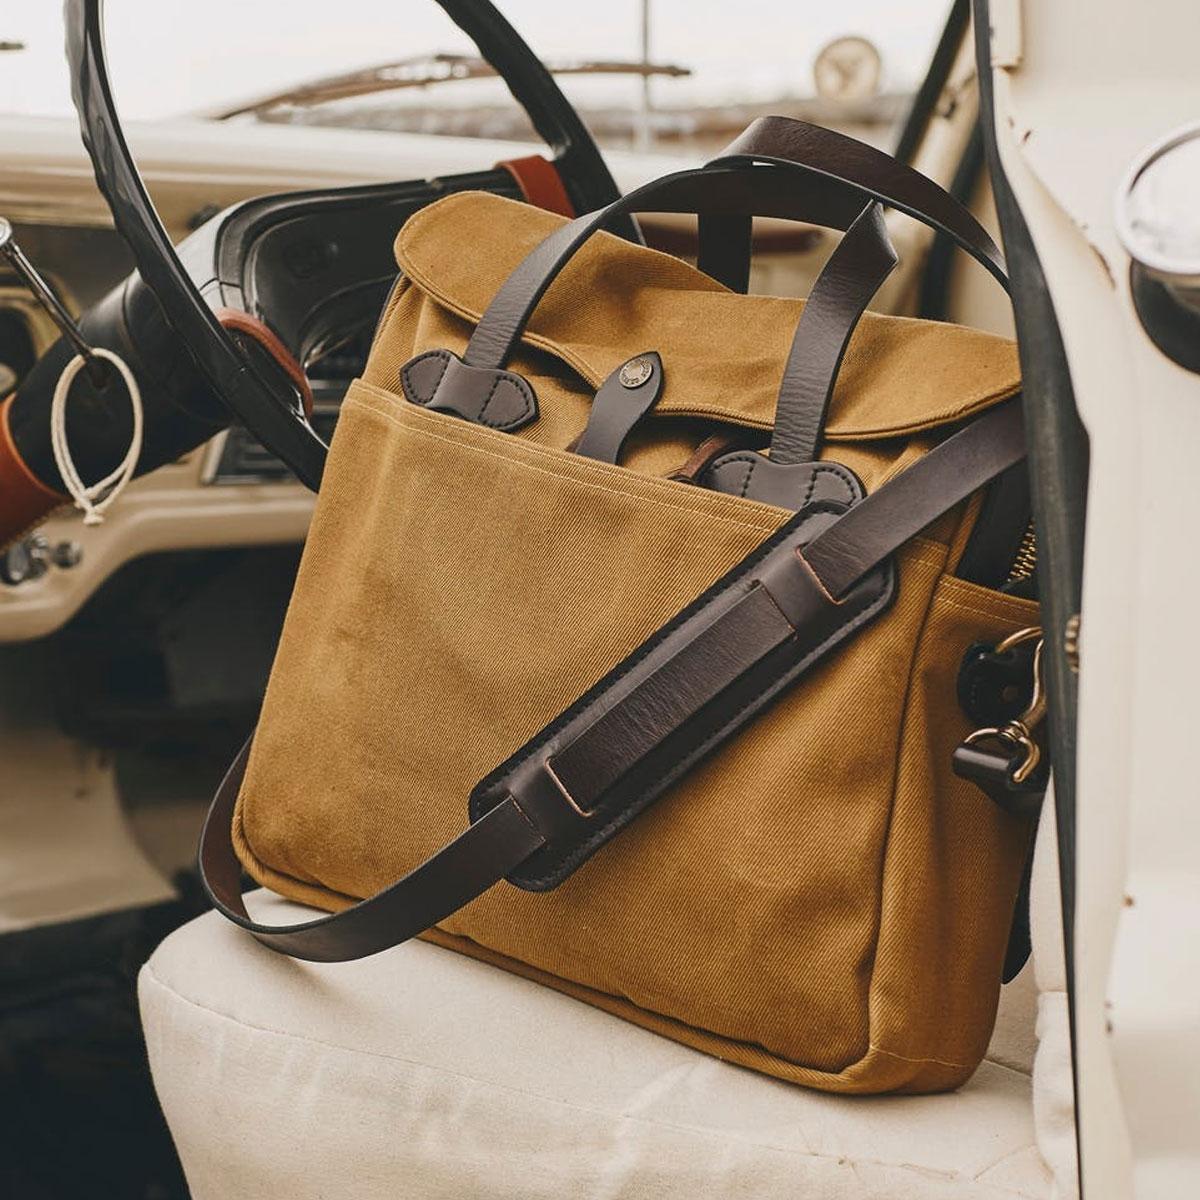 Filson Original Briefcase 11070256 Tan, extraordinary bag for an ordinary day